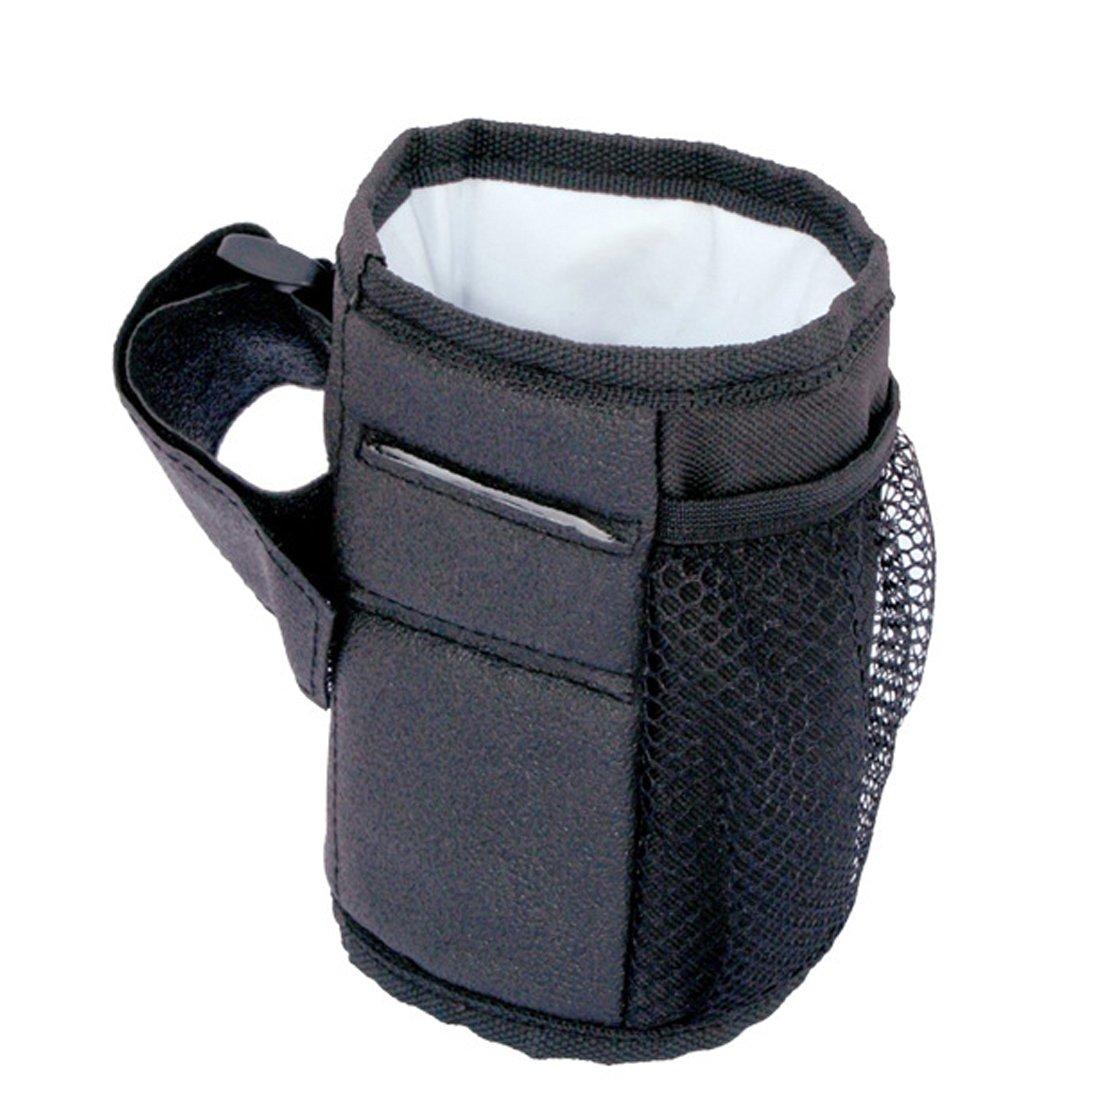 Universal for Buggy Wheelchair Stuff Stroller Pocket Baby Cup Holder Stroller Bottle Cup Holder